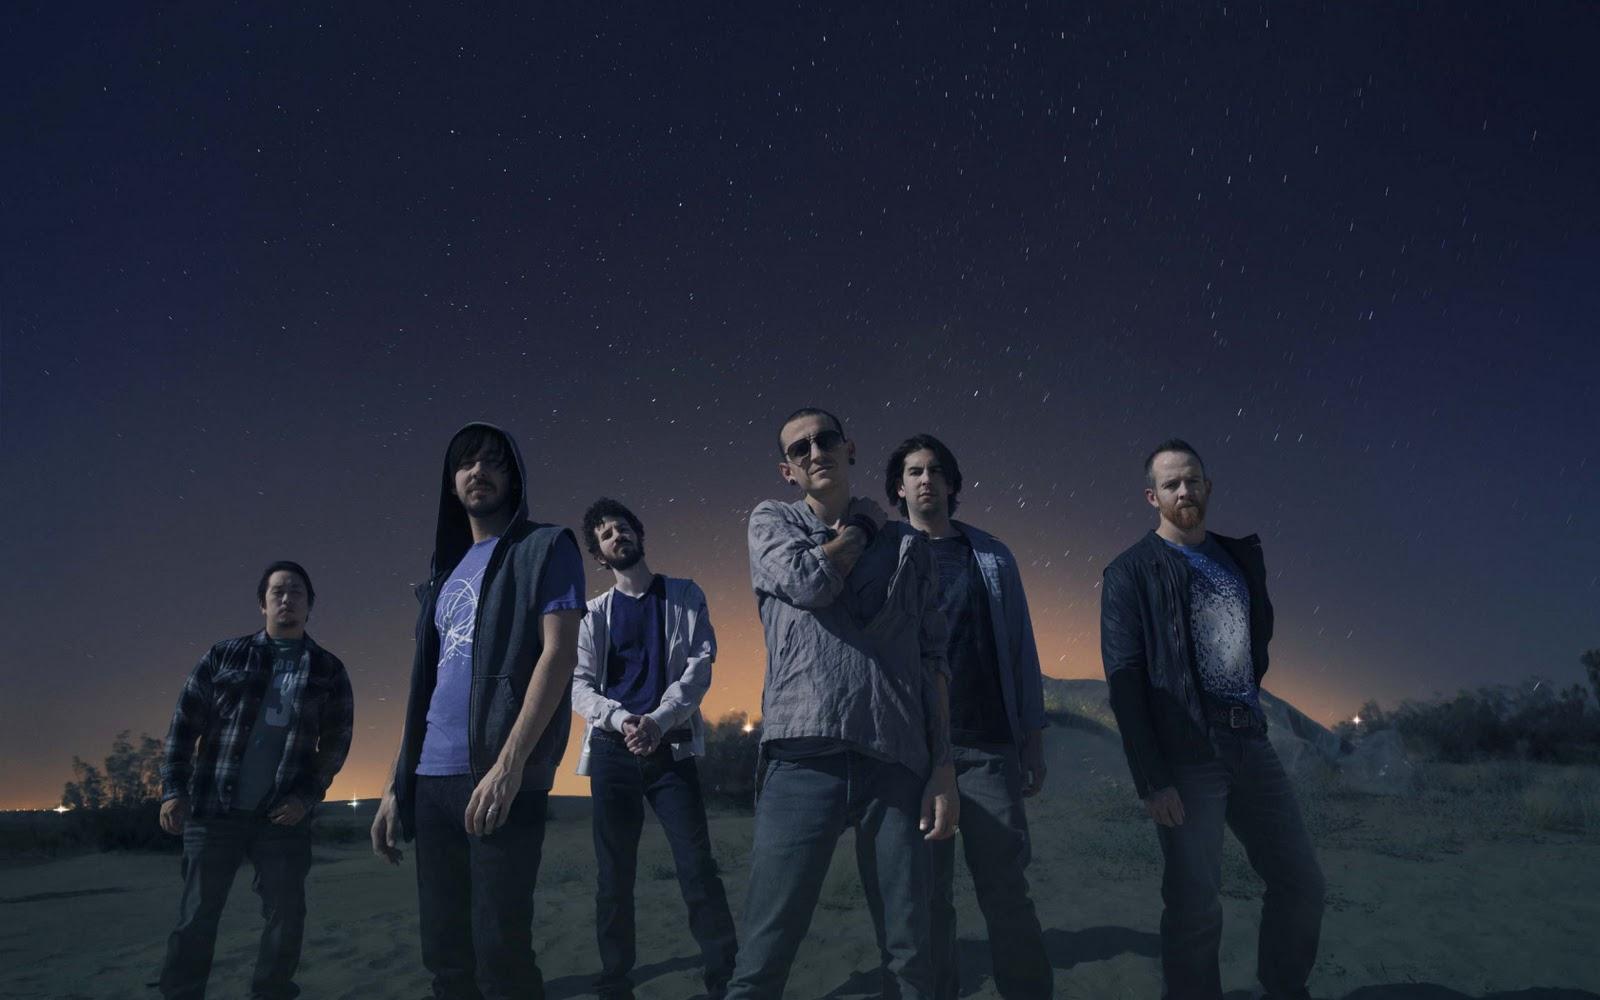 Killzone Shadow Fall Wallpaper Iphone Wallpapers Hd Linkin Park Banda De Rock 32 Hd